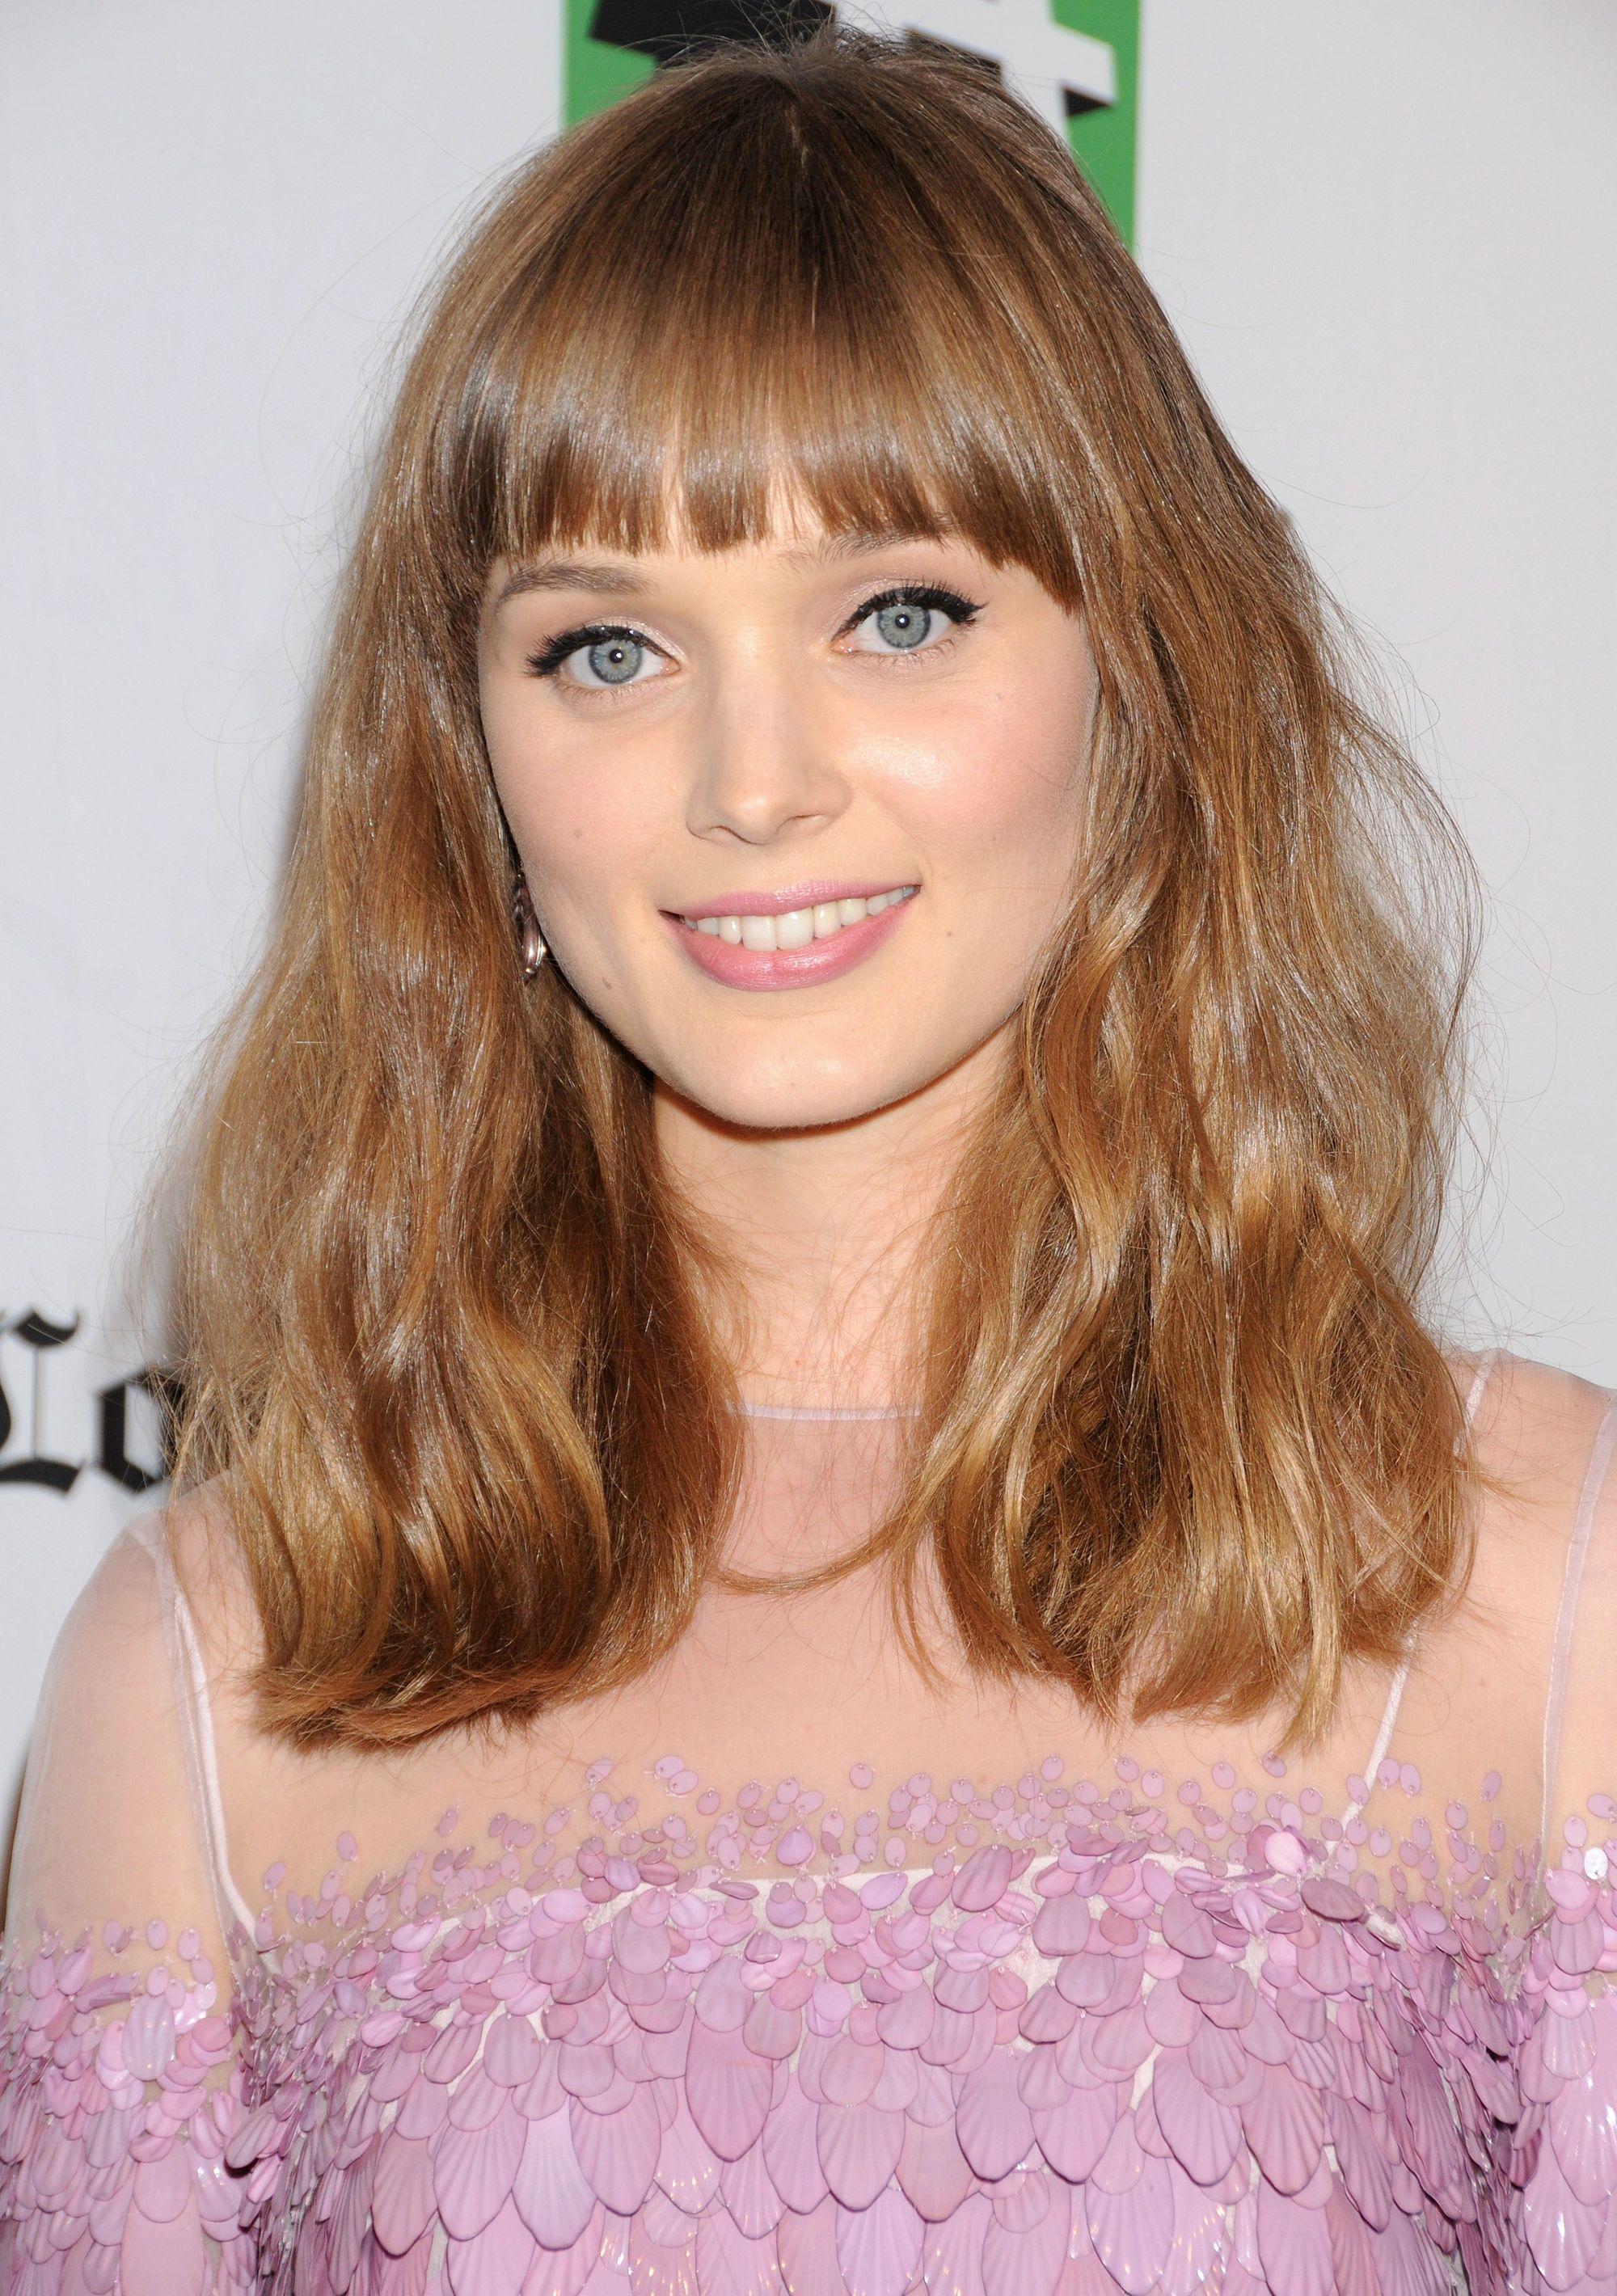 bangs for fine hair: bella heathcote with long bangs and wavy hair smiling